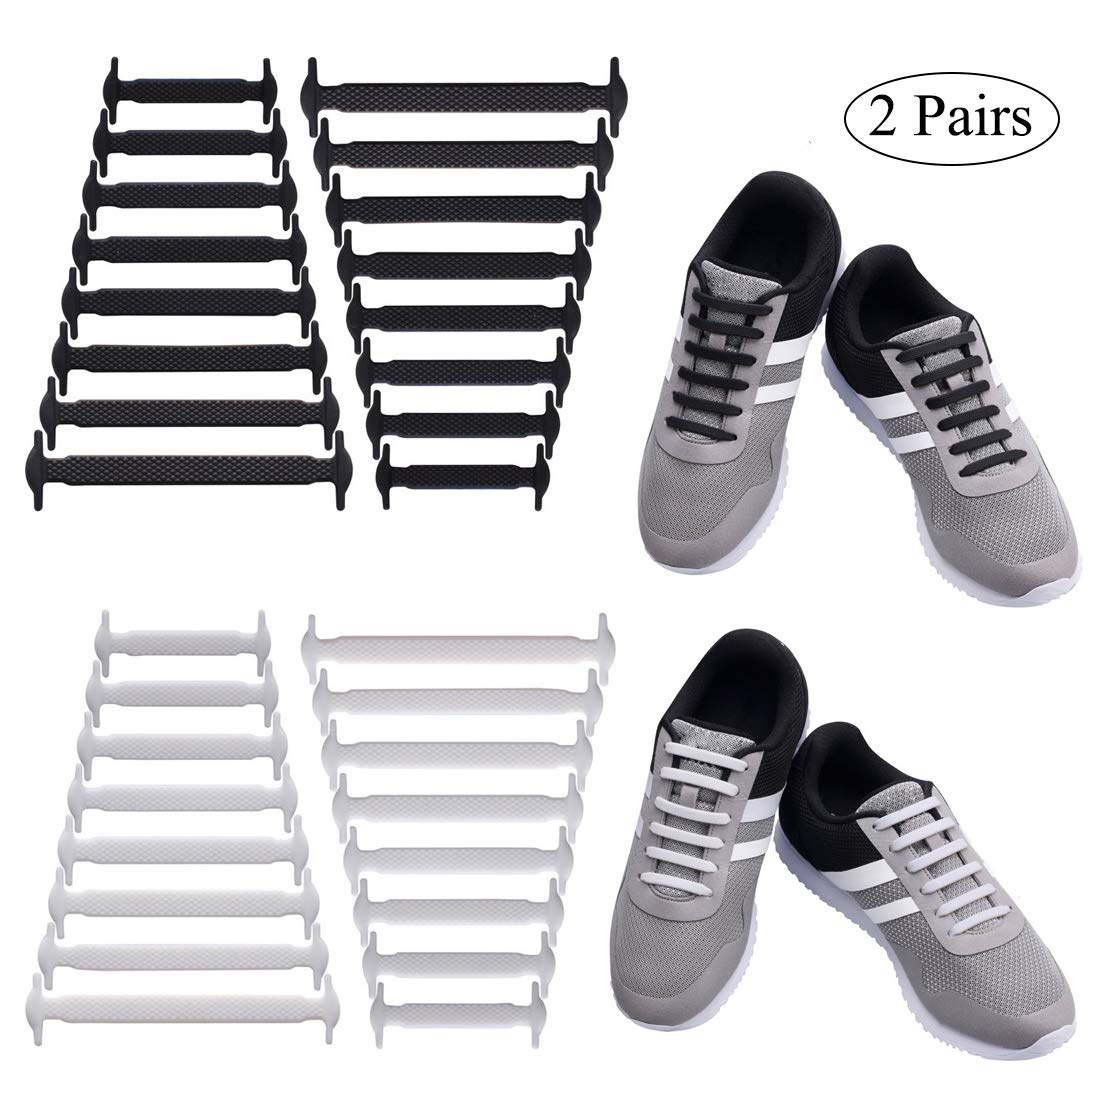 a6f3b6892dfe Uniqhia No Tie Shoelaces Kids Adults - Multicolor Fashion Sports Fan  Shoelaces - Fits Most Types Shoes - Sneaker Boots